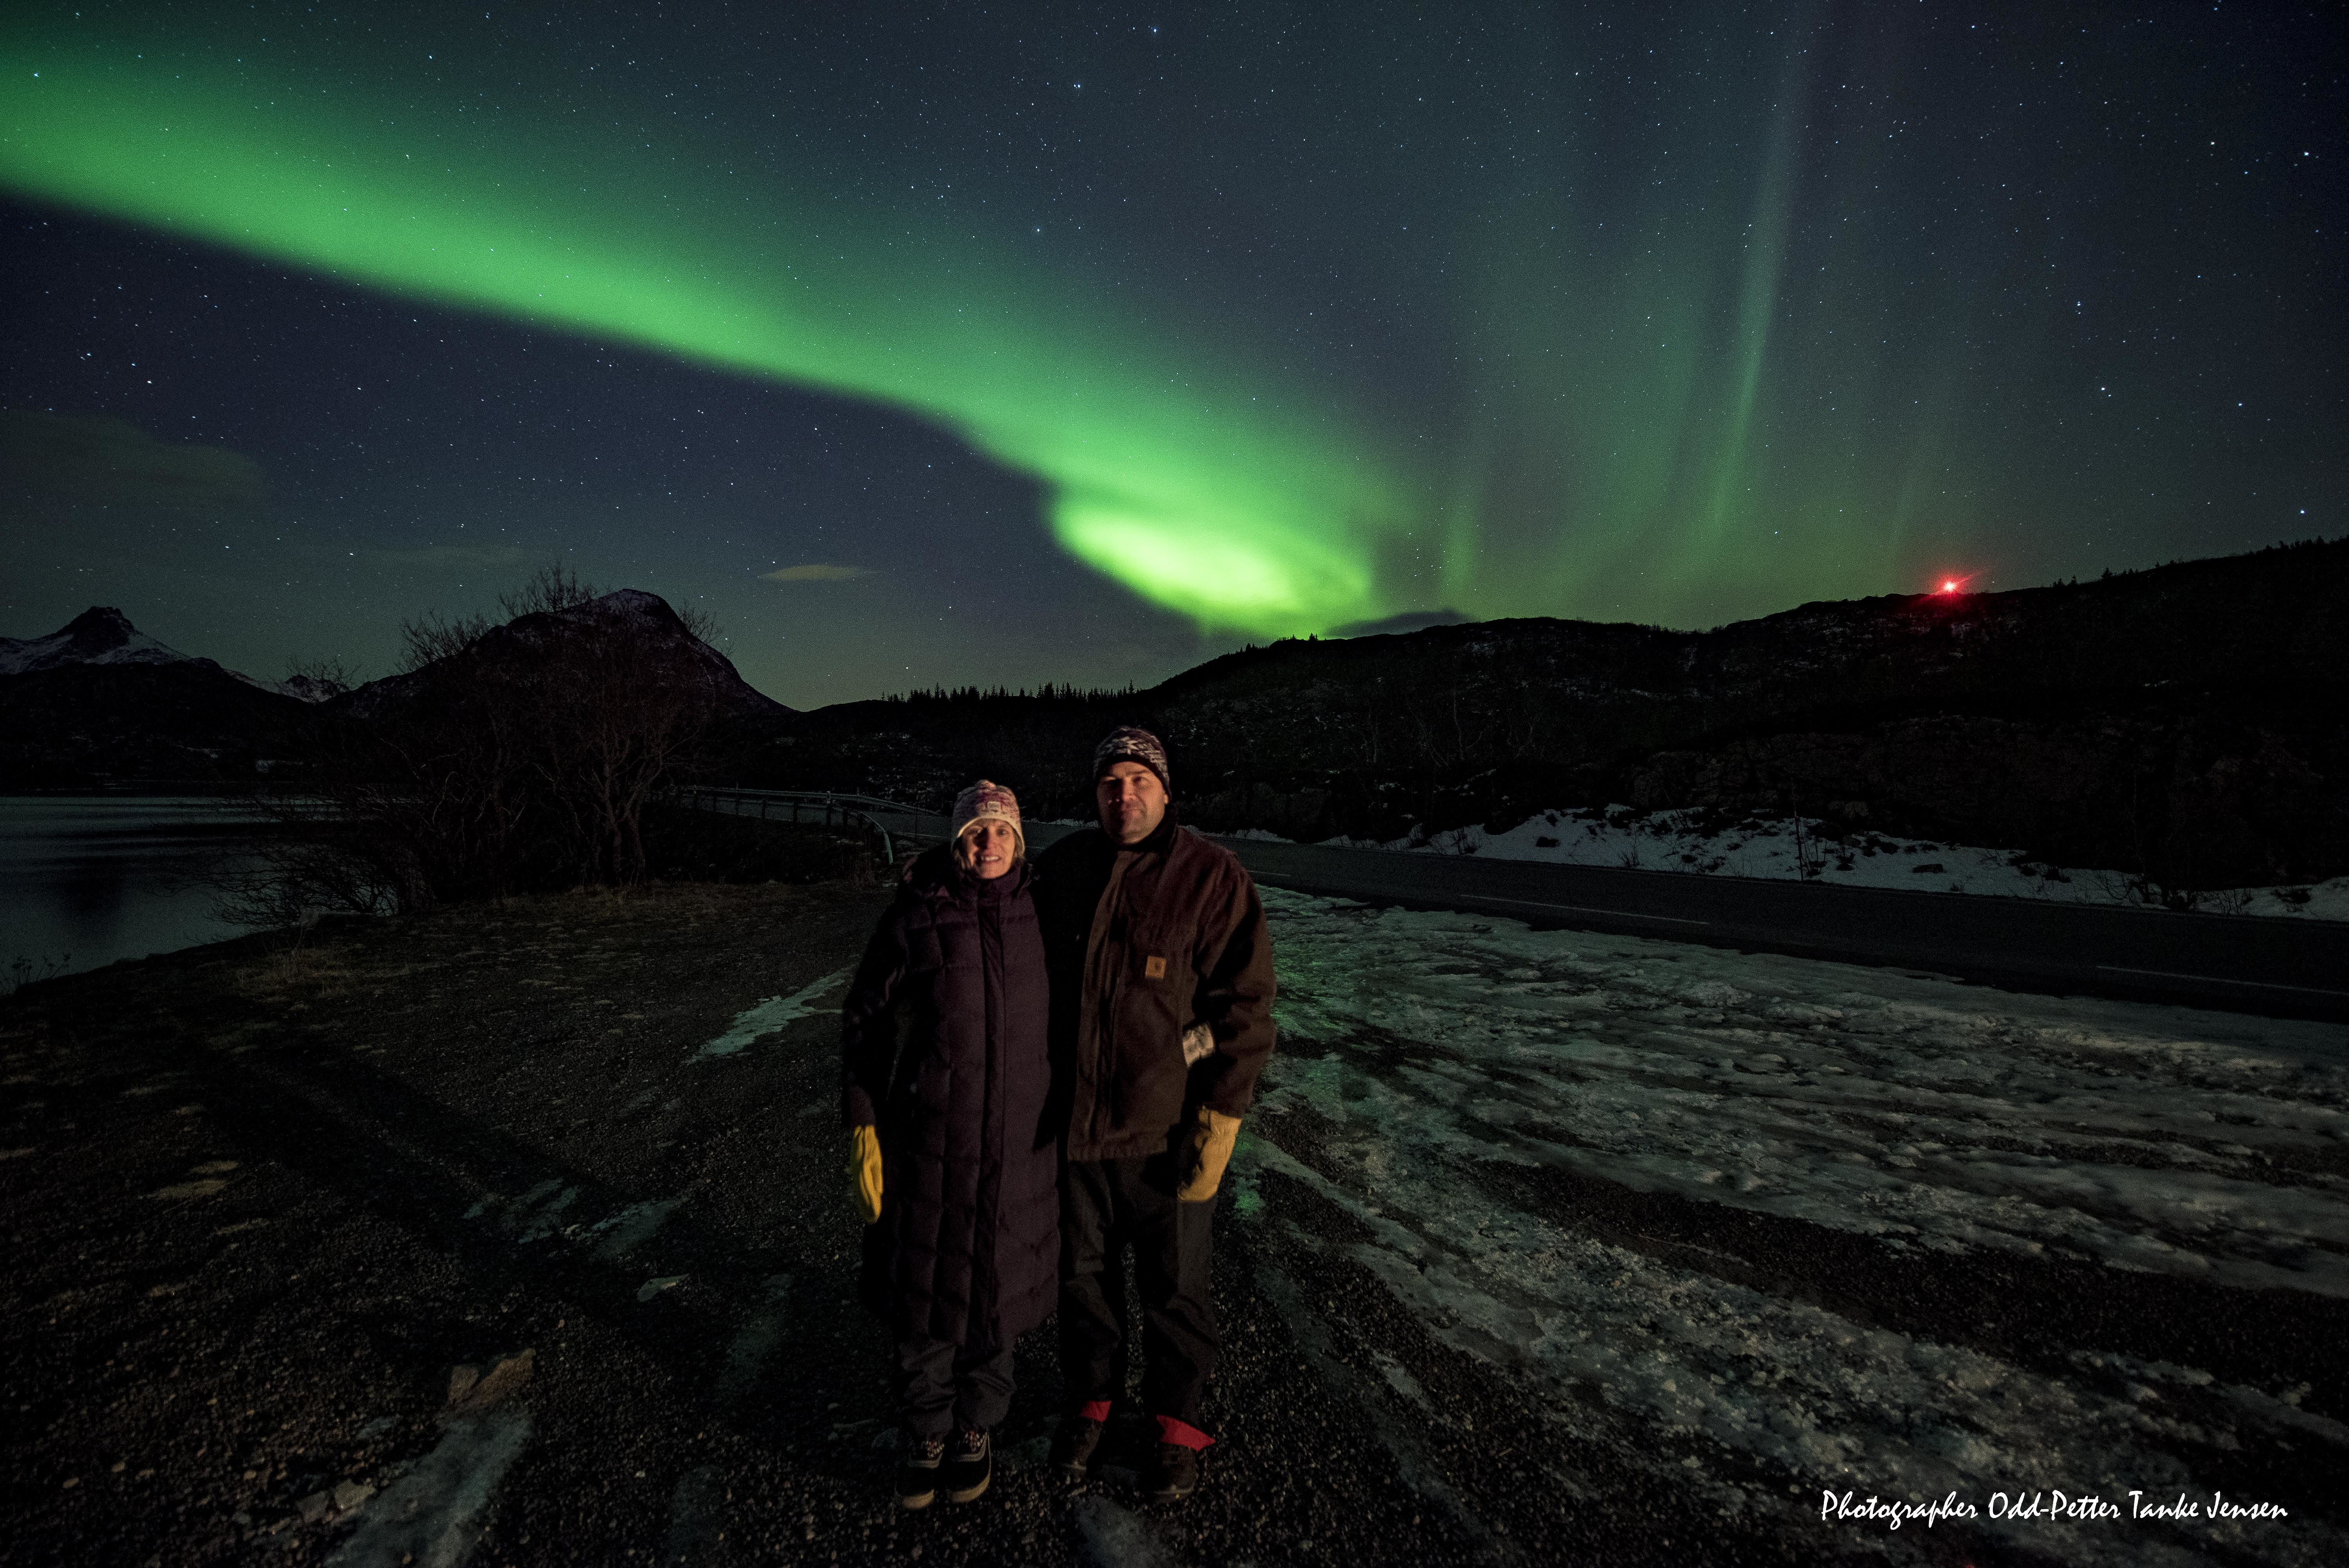 © Odd-Petter Tanke Jensen, Northern Lights in Lofoten